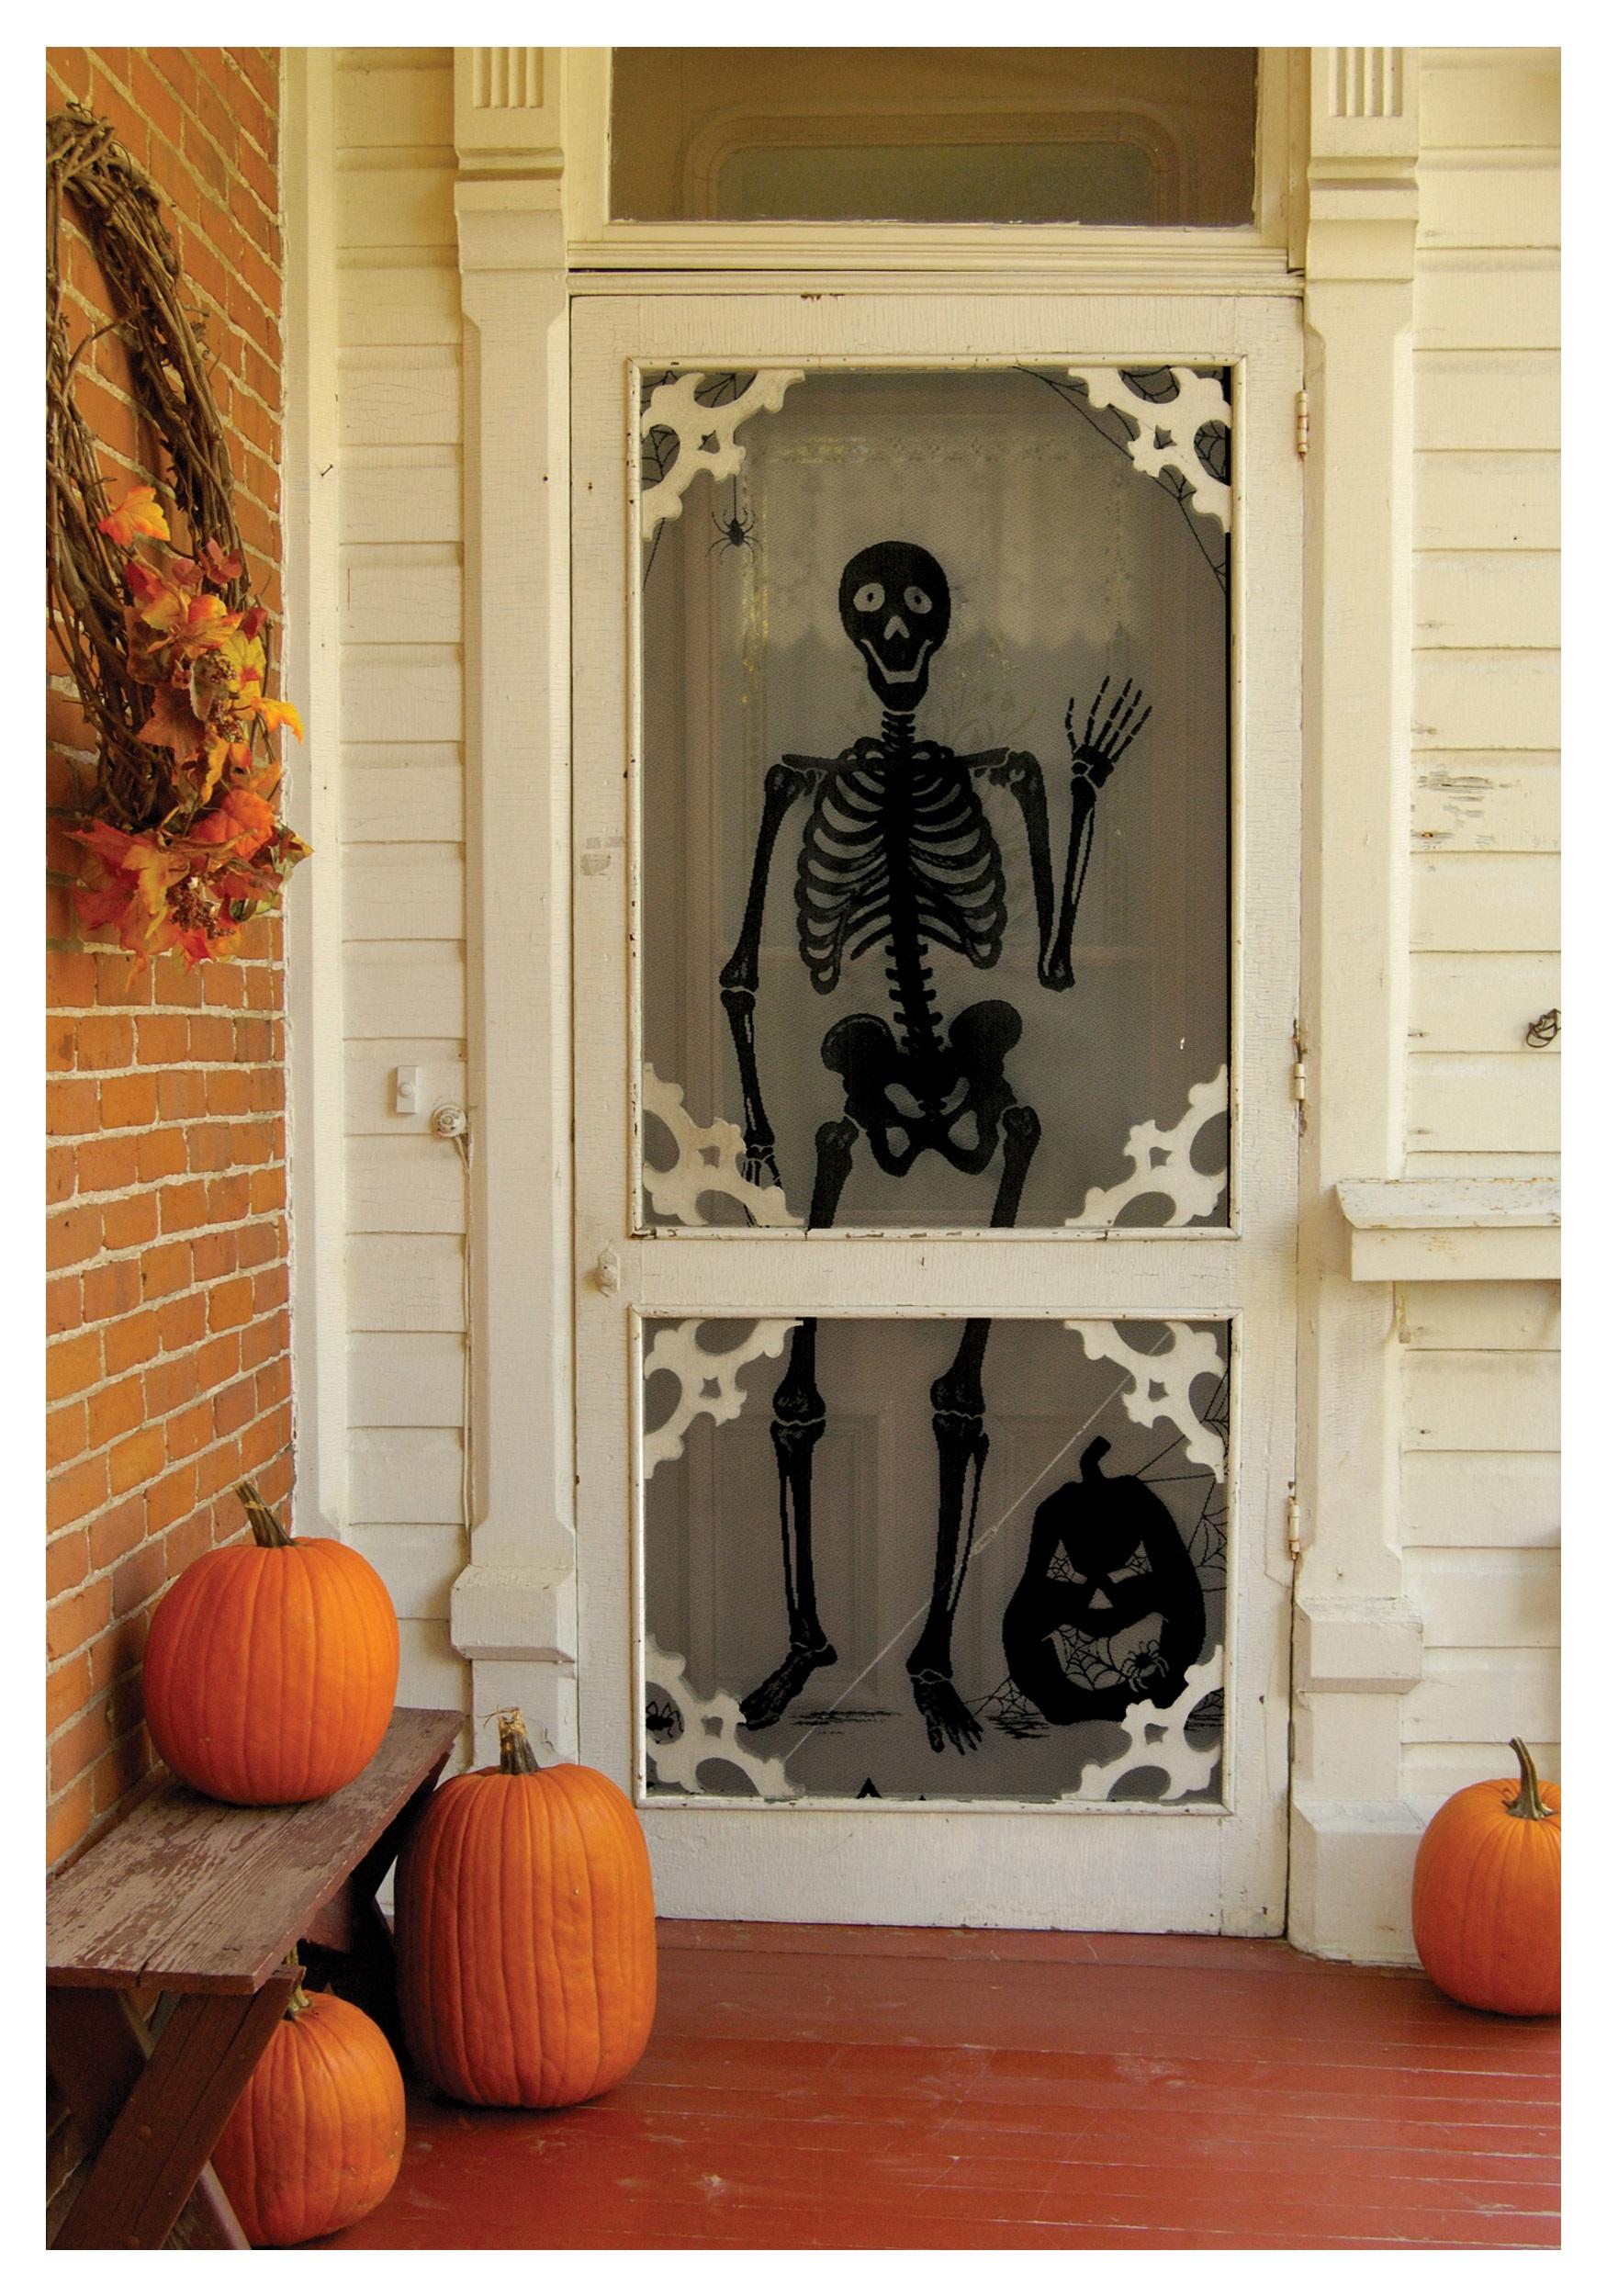 Skeleton-Gothic-Halloween-Decorations